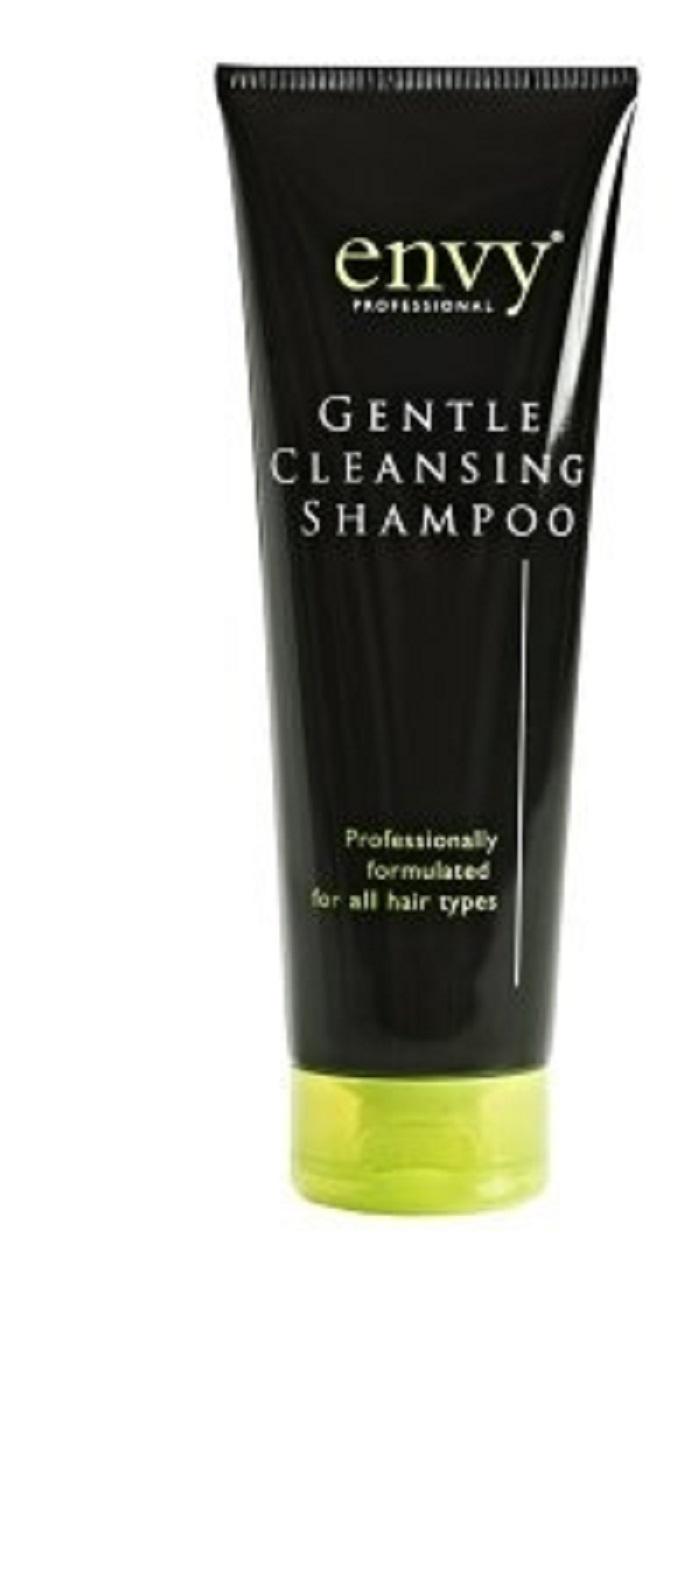 Шампунь очищающий Envy Professional Gentle Cleansing, 250 мл